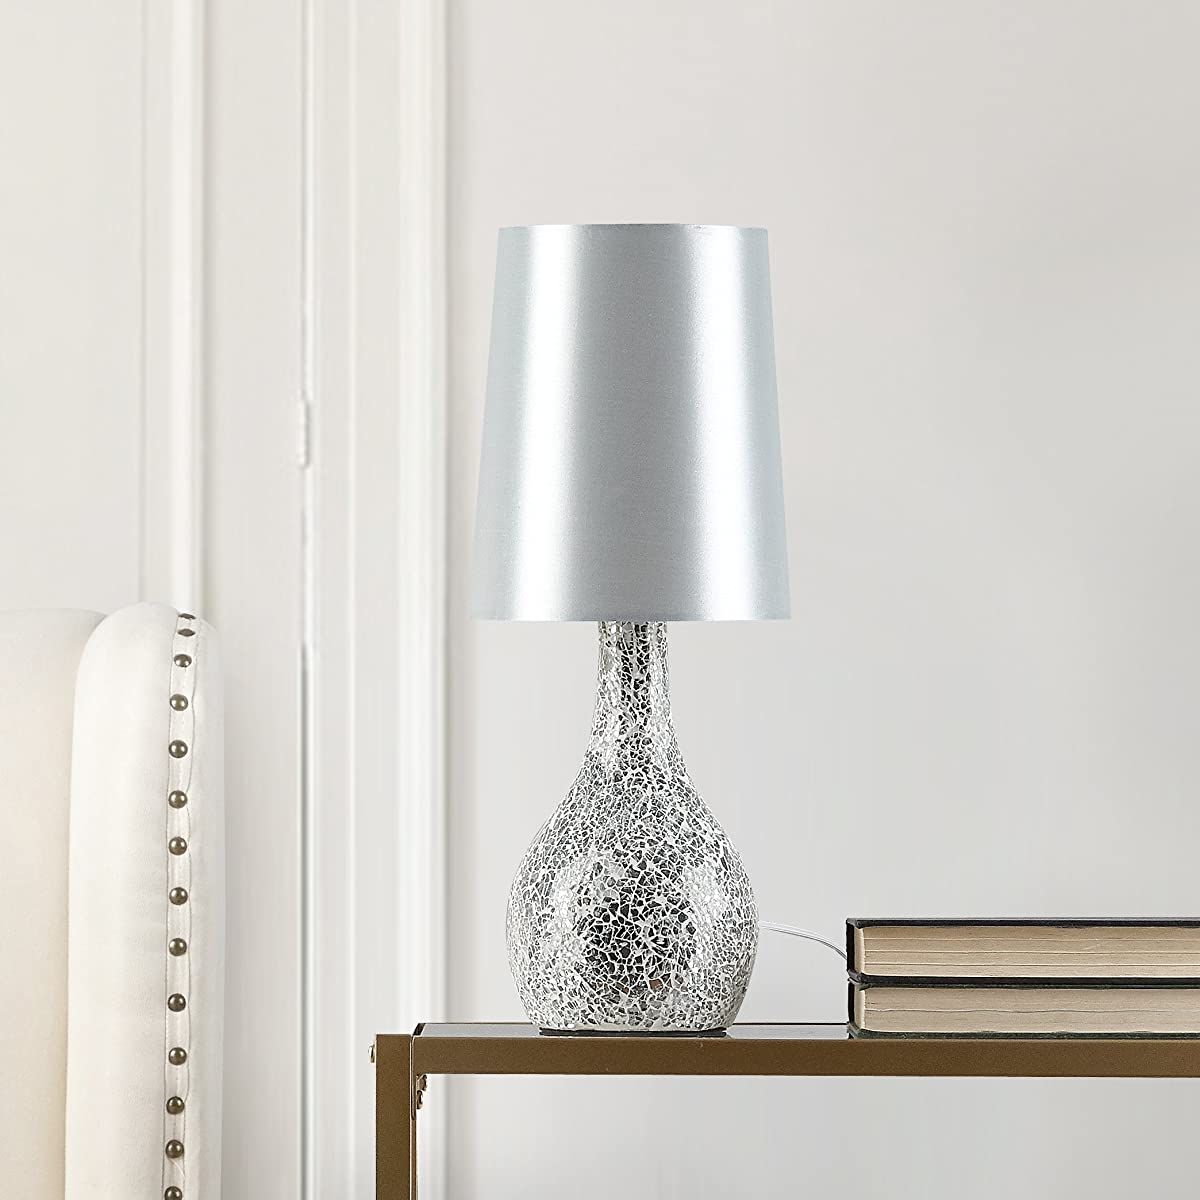 Urban Shop Mosaic Glass Lamp with Satin Shade, Silver